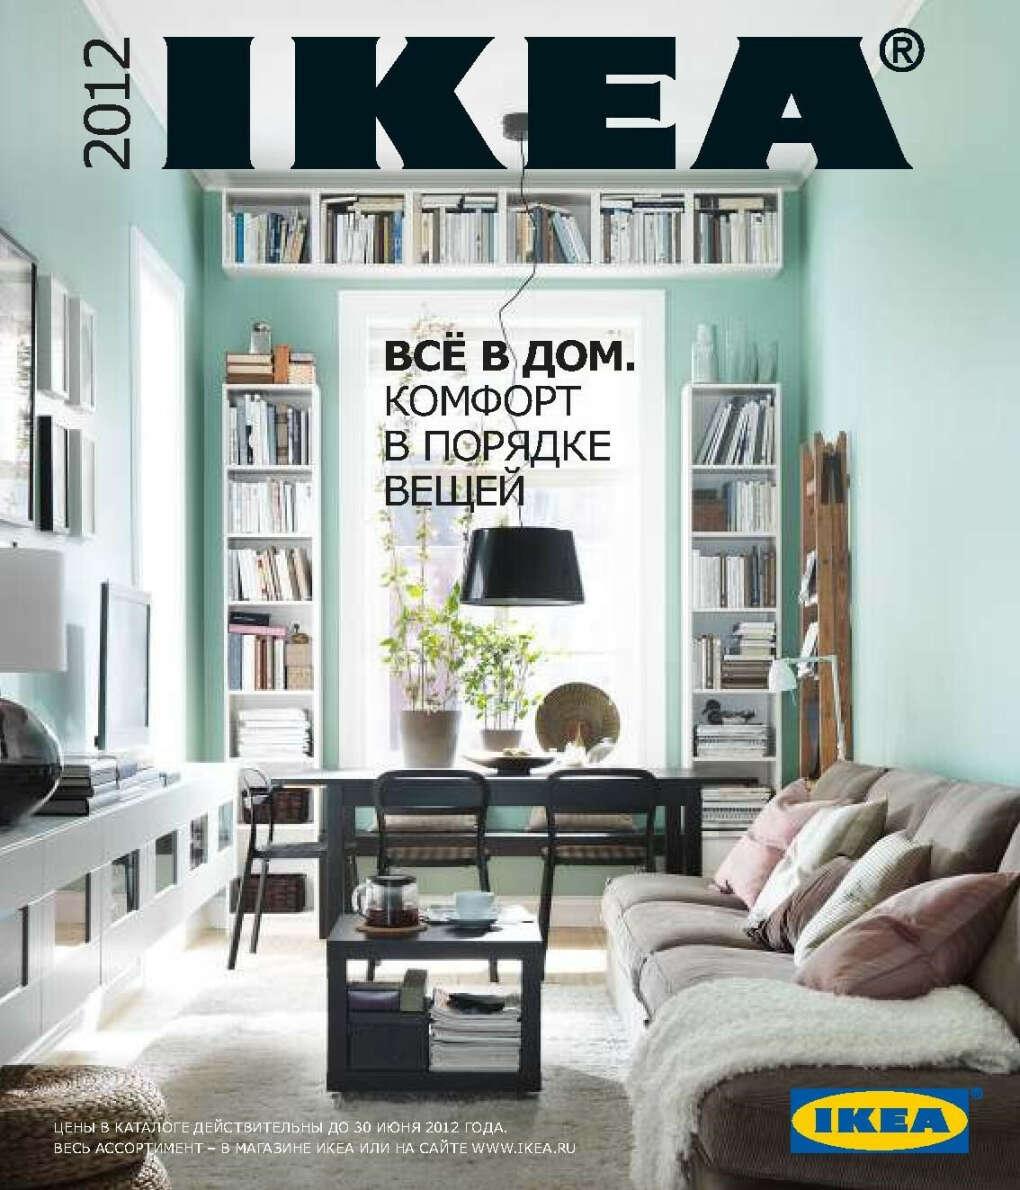 IKEA Подарочная карта на любую сумму